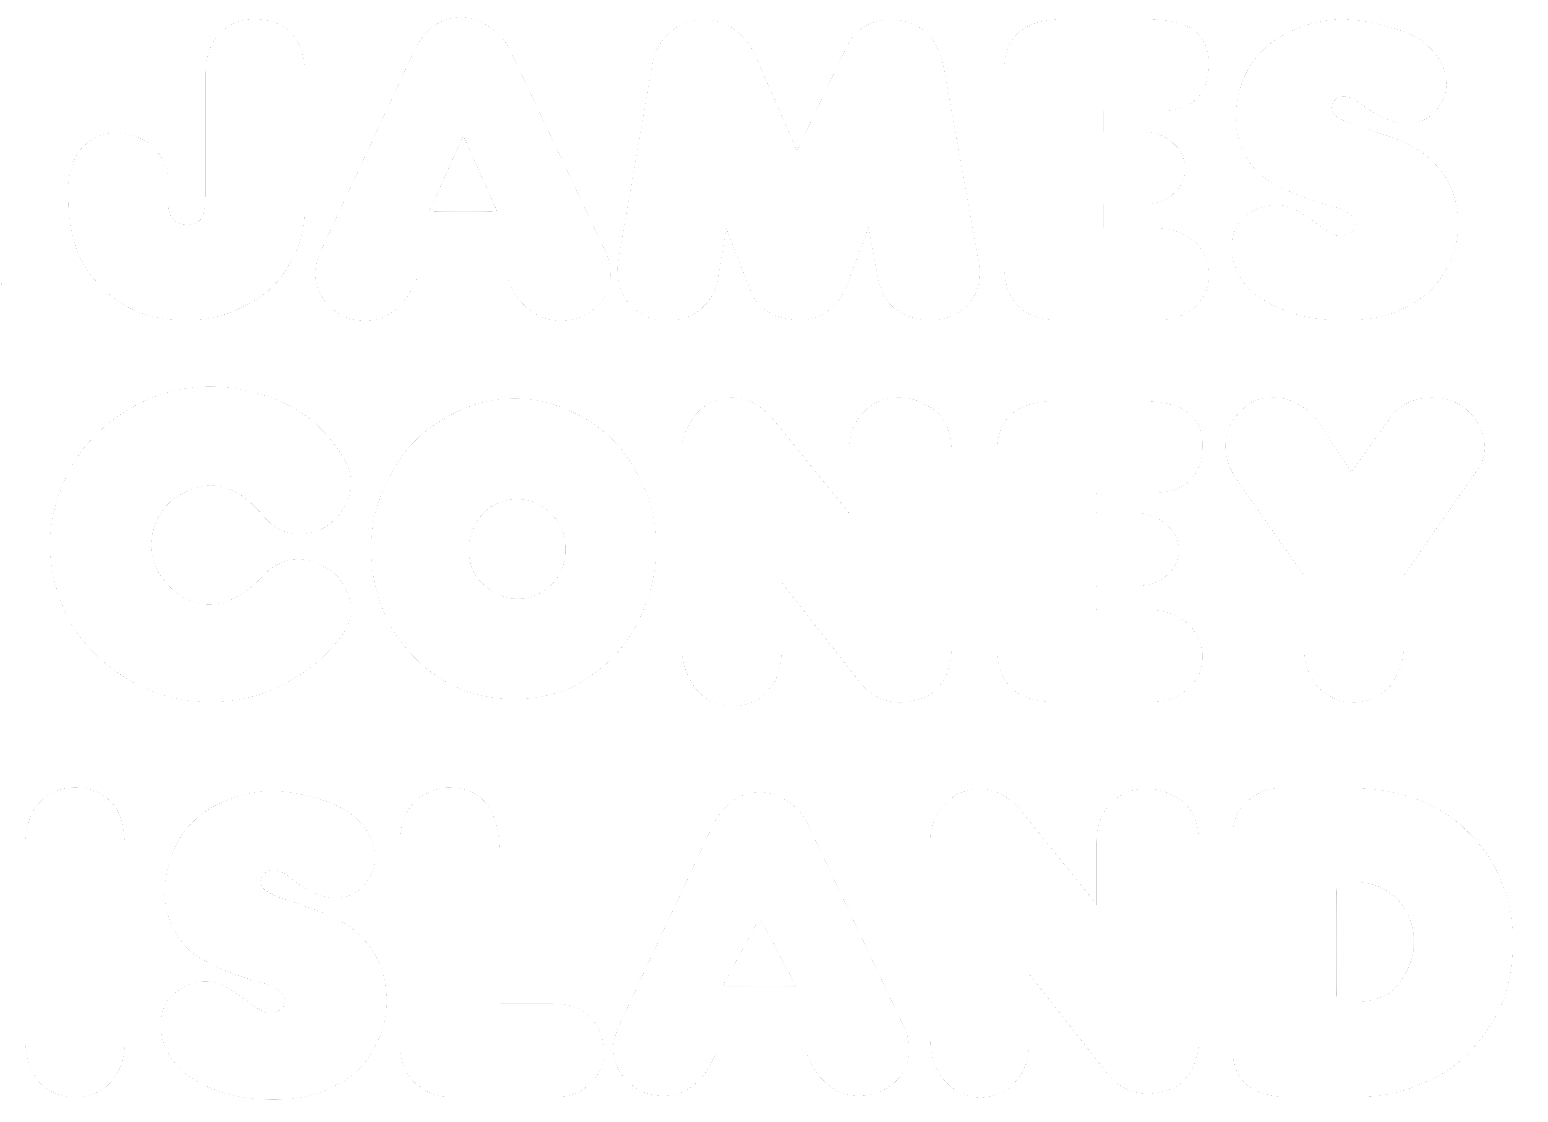 Logo for My JCI Rewards, the loyalty program of James Coney Island.